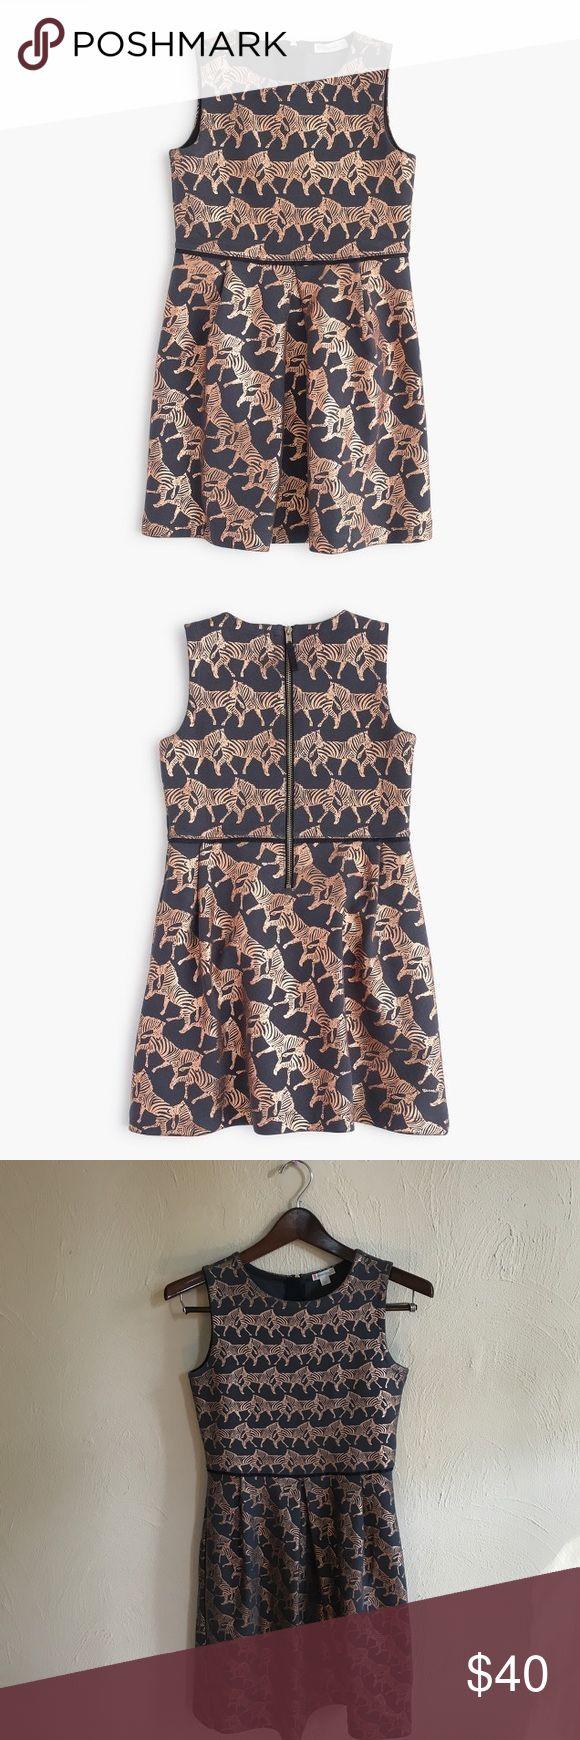 best 25 zebra print dresses ideas on pinterest zebra print